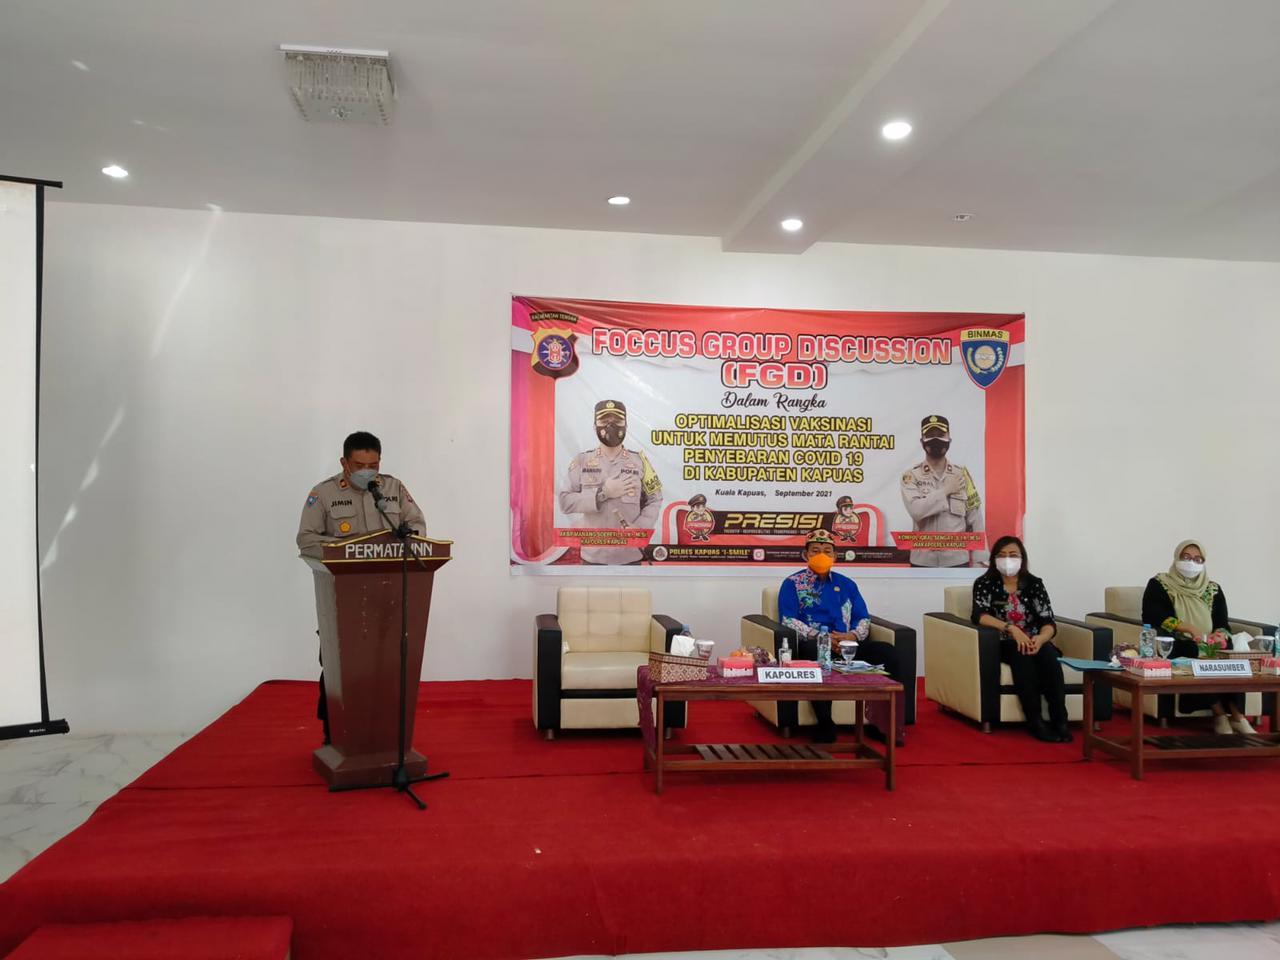 Kasat Binmas saat menyampaikan sambutan dalam pembukaan kegiatan FGD